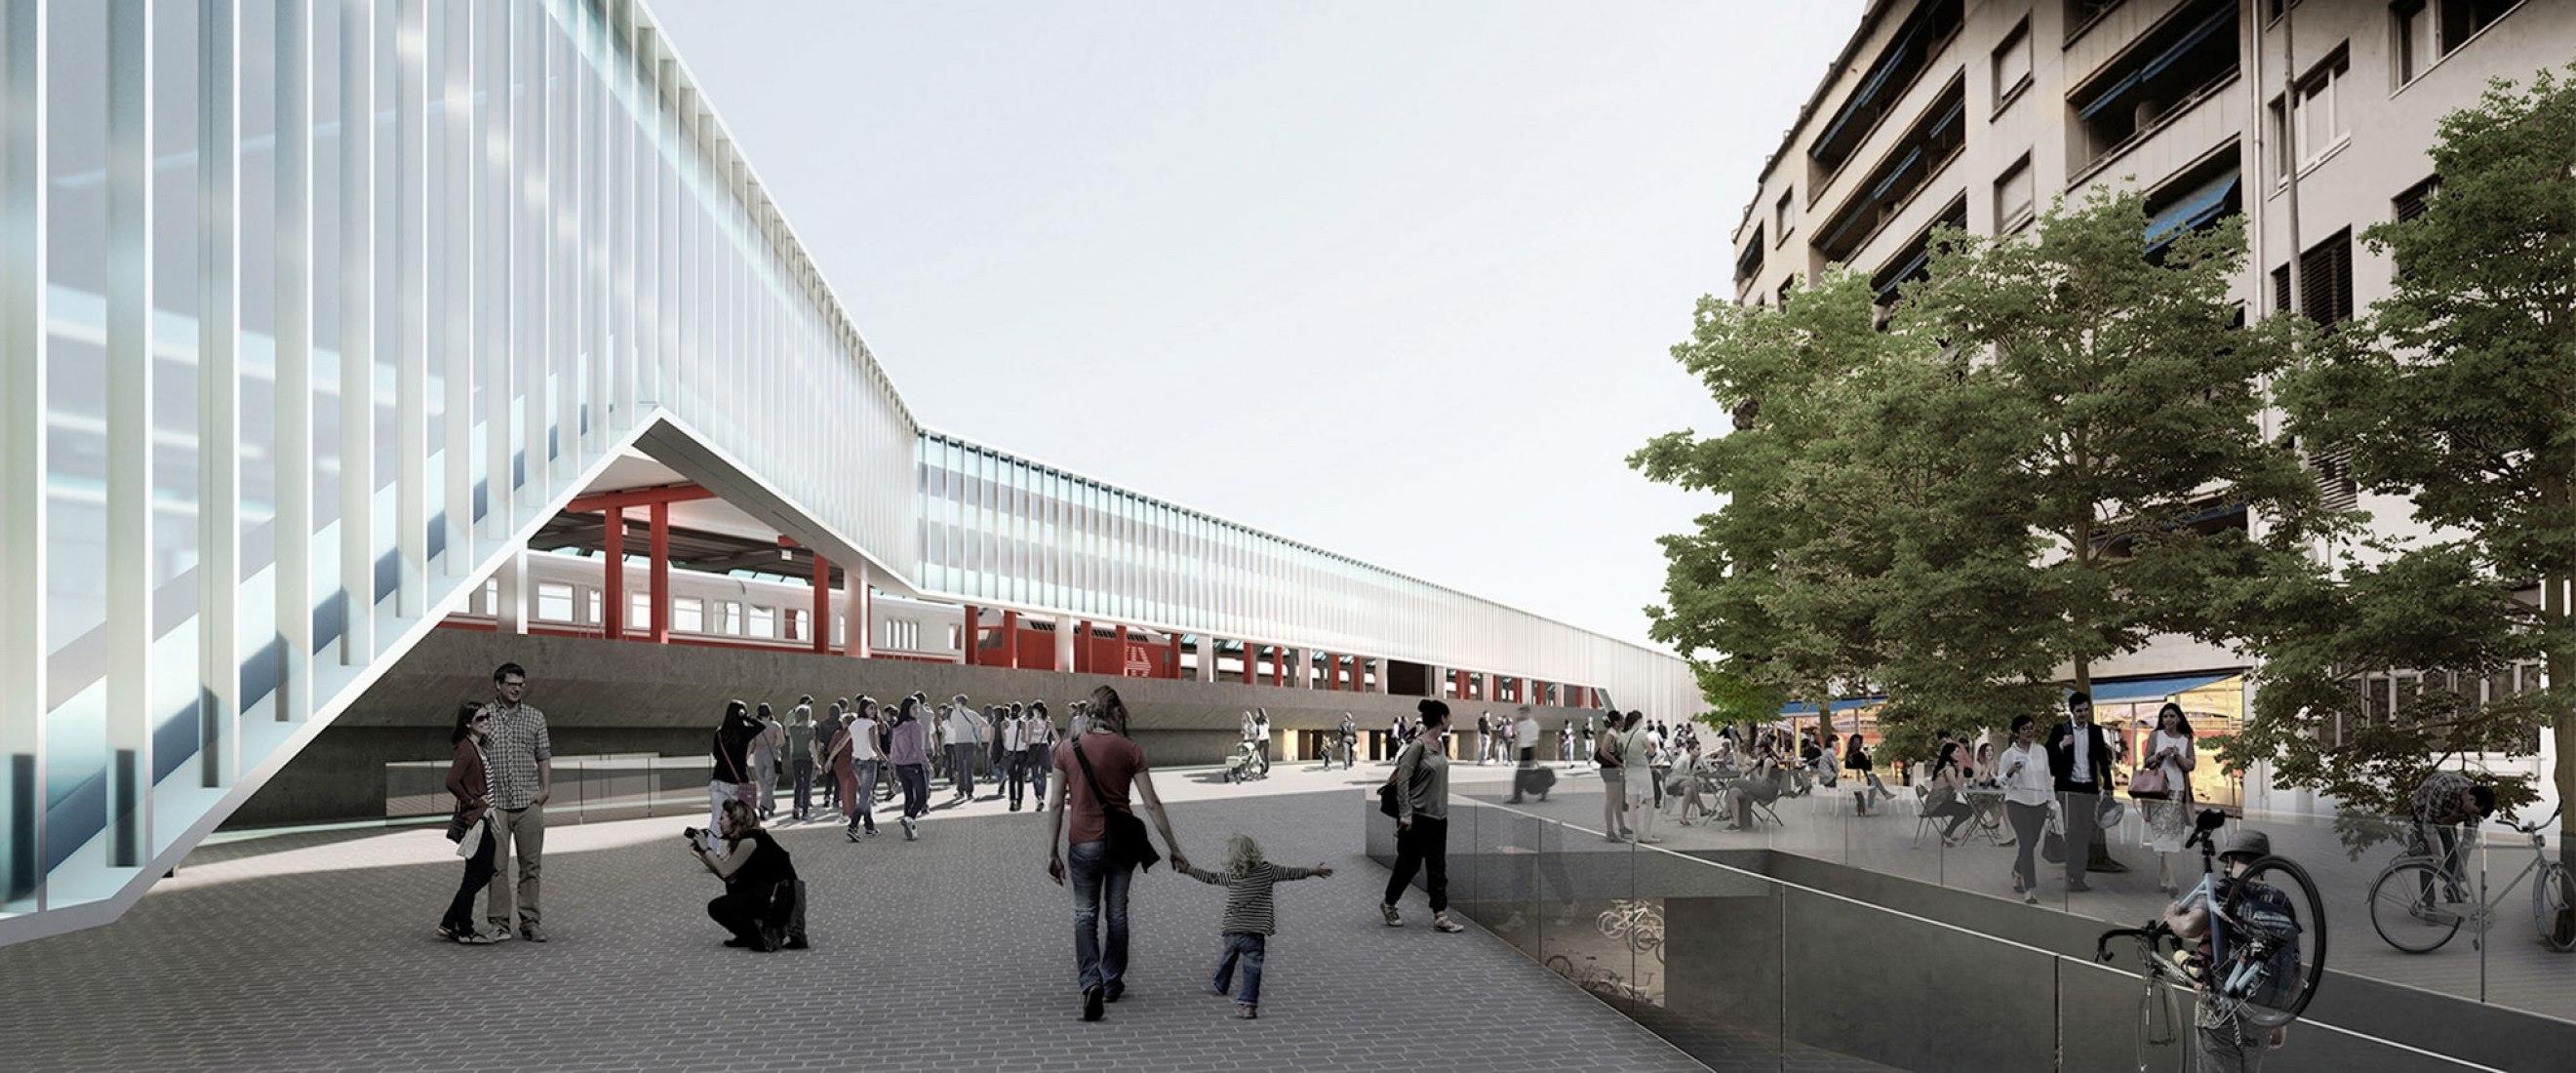 Rendering new railway station of Cornavin, Geneva by Vázquez Consuegra and Frei Rezakhanlou